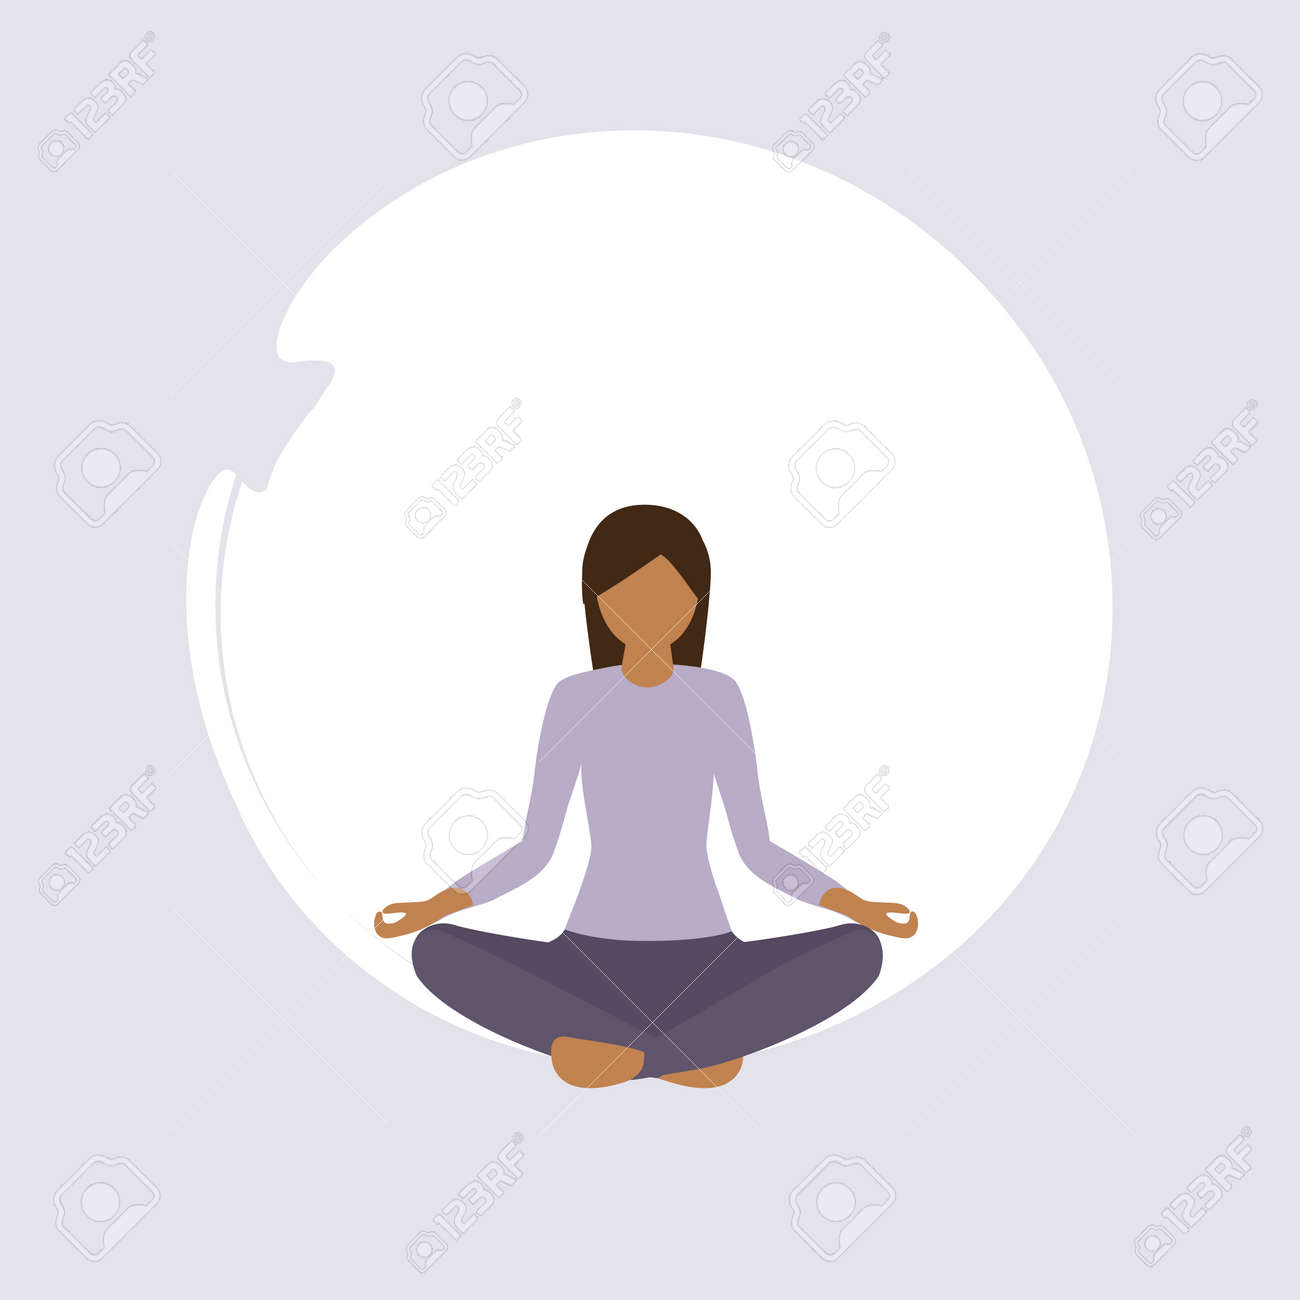 girl doing yoga exercise healthy lifestyle fitness design vector illustration - 168077365